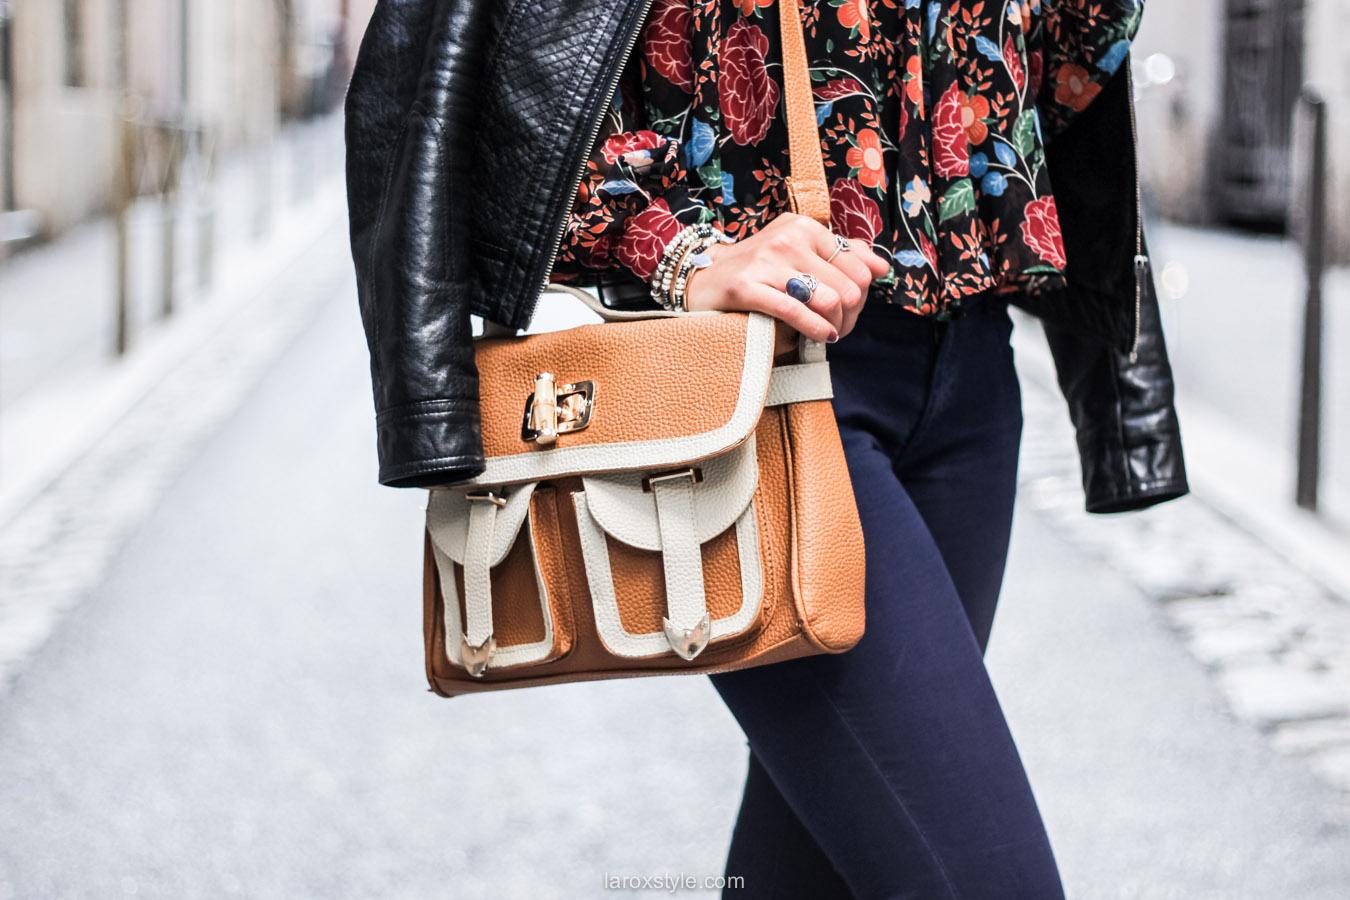 blouse fleurie - sac vintage - laroxstyle blog mode lyon-15